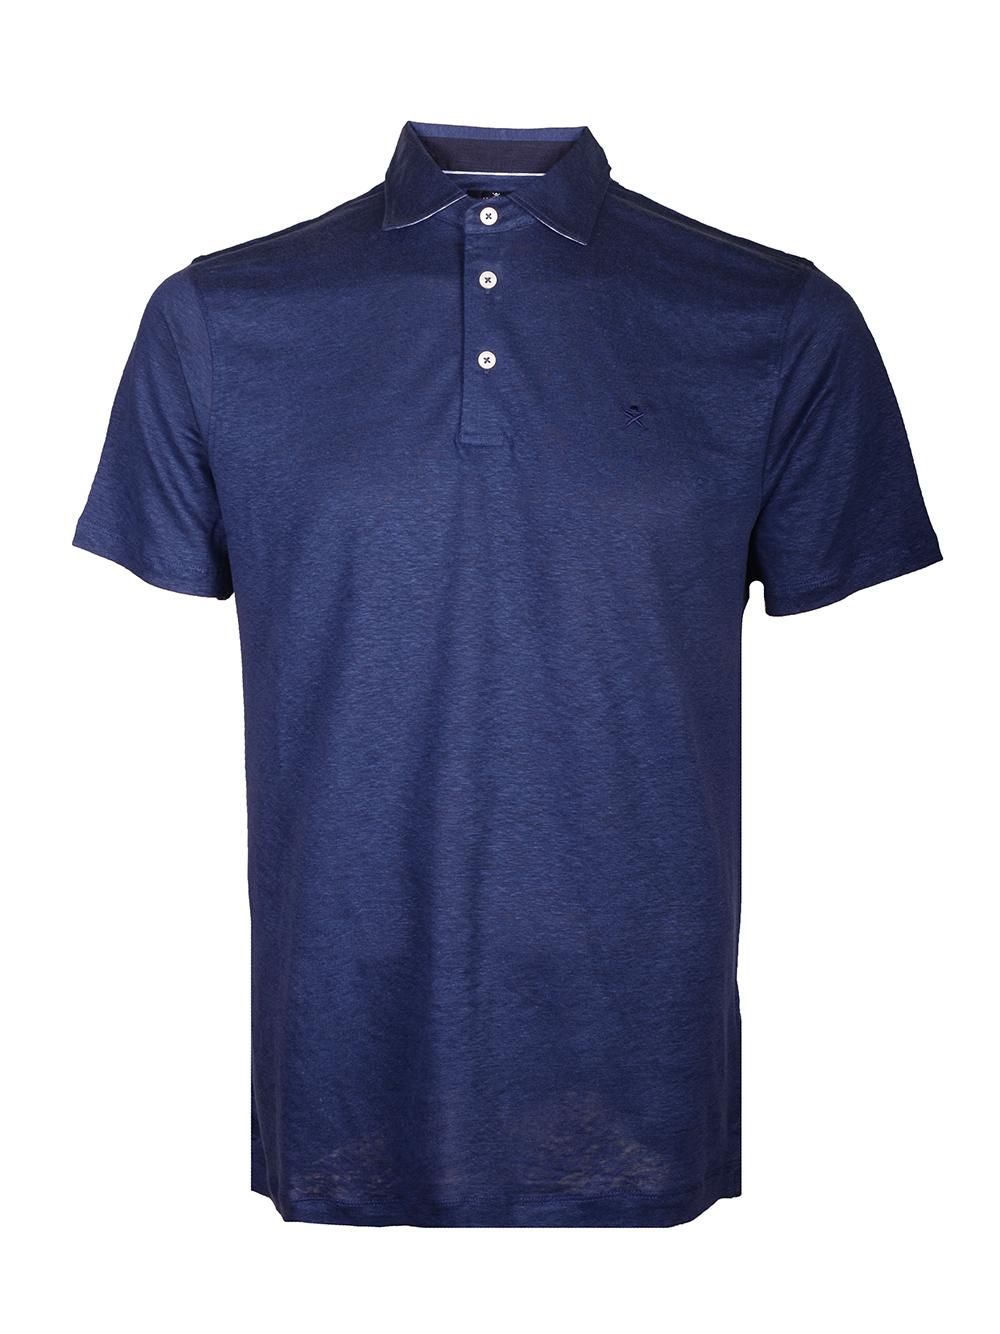 HACKETT Μπλούζα Polo HM562588-595 ΜΠΛΕ